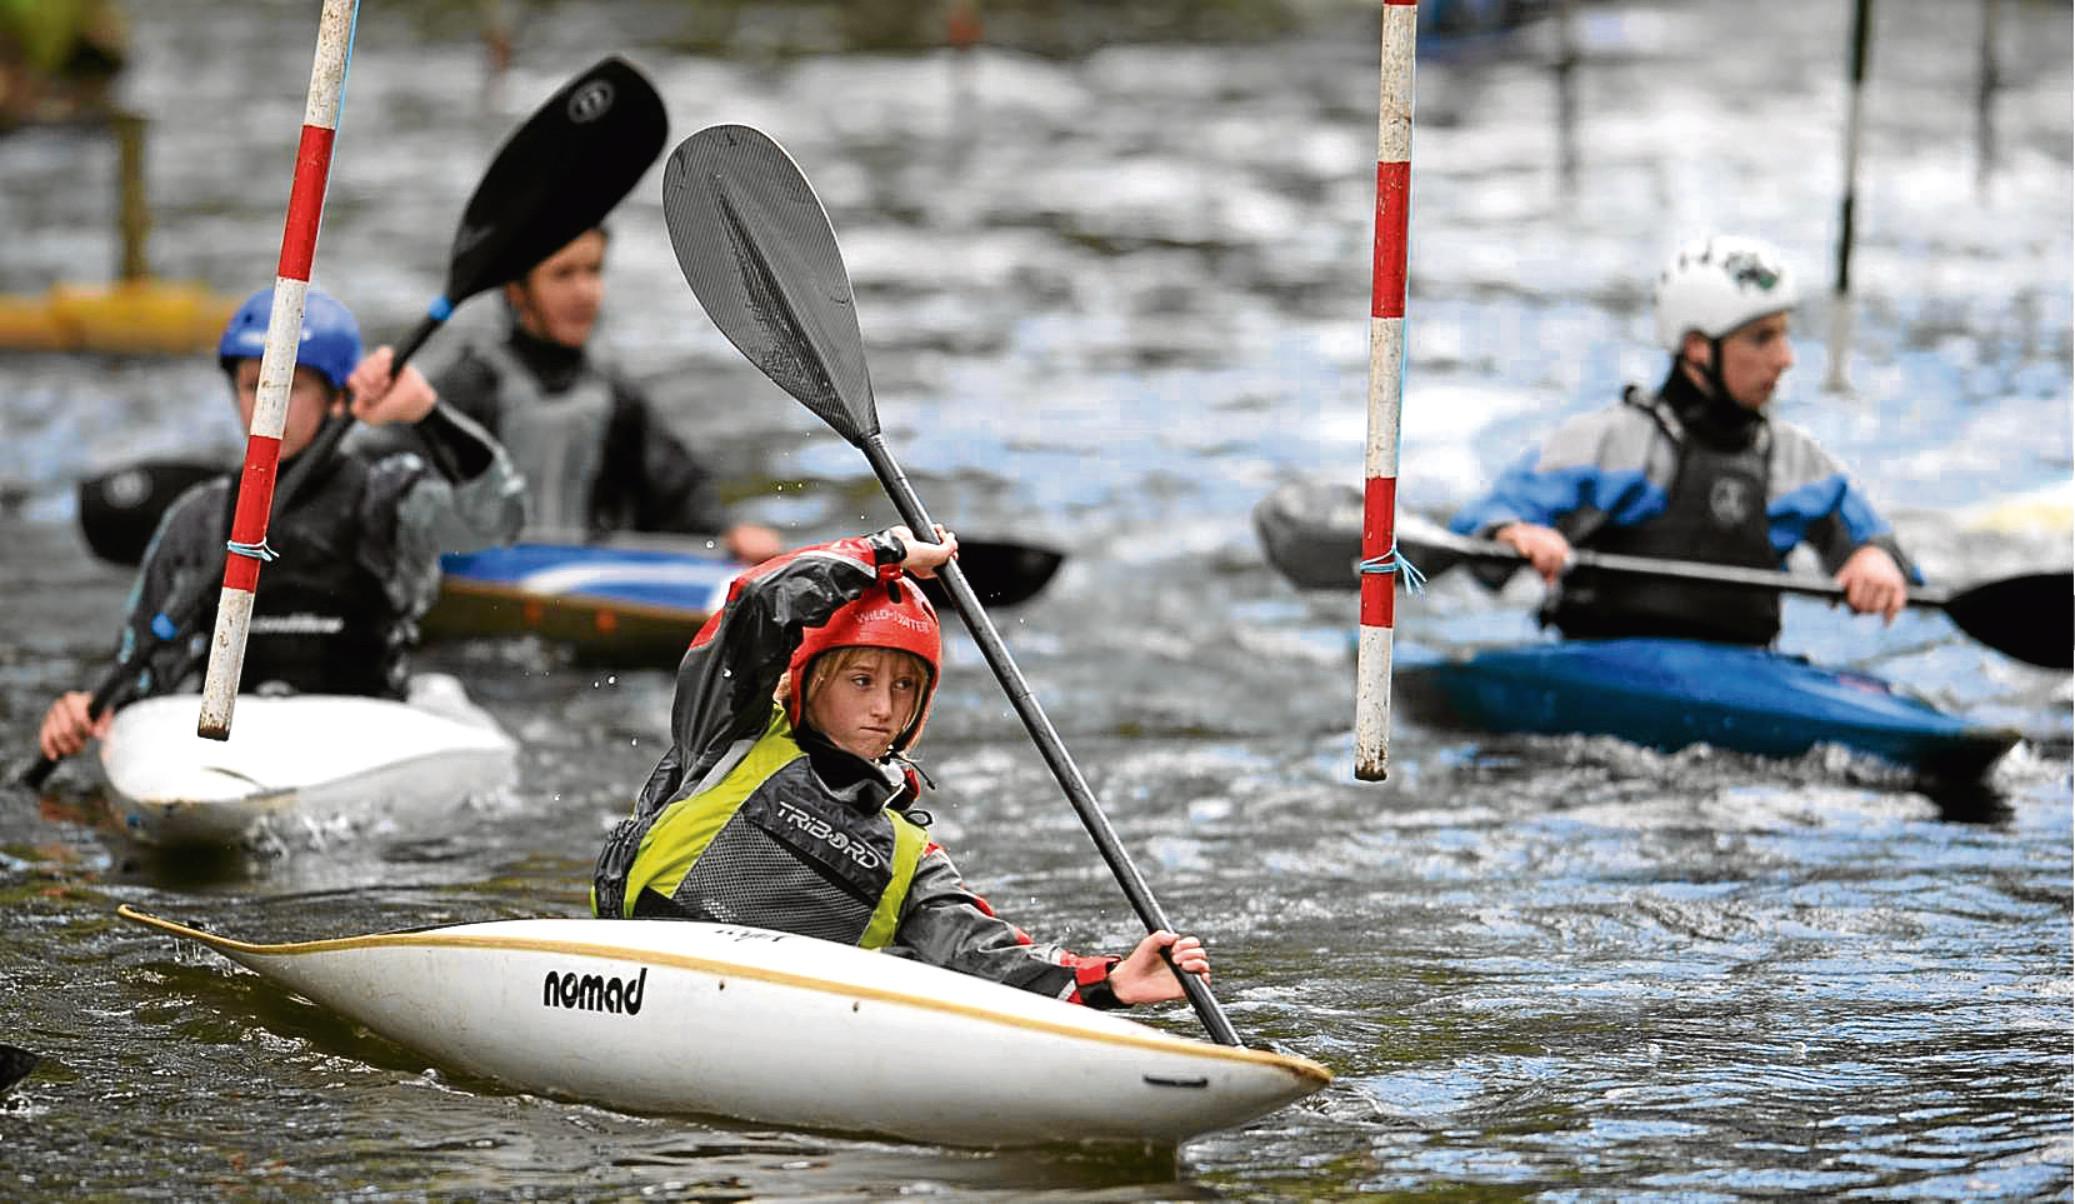 Kayak slalom at Seaton Park on the River Don.